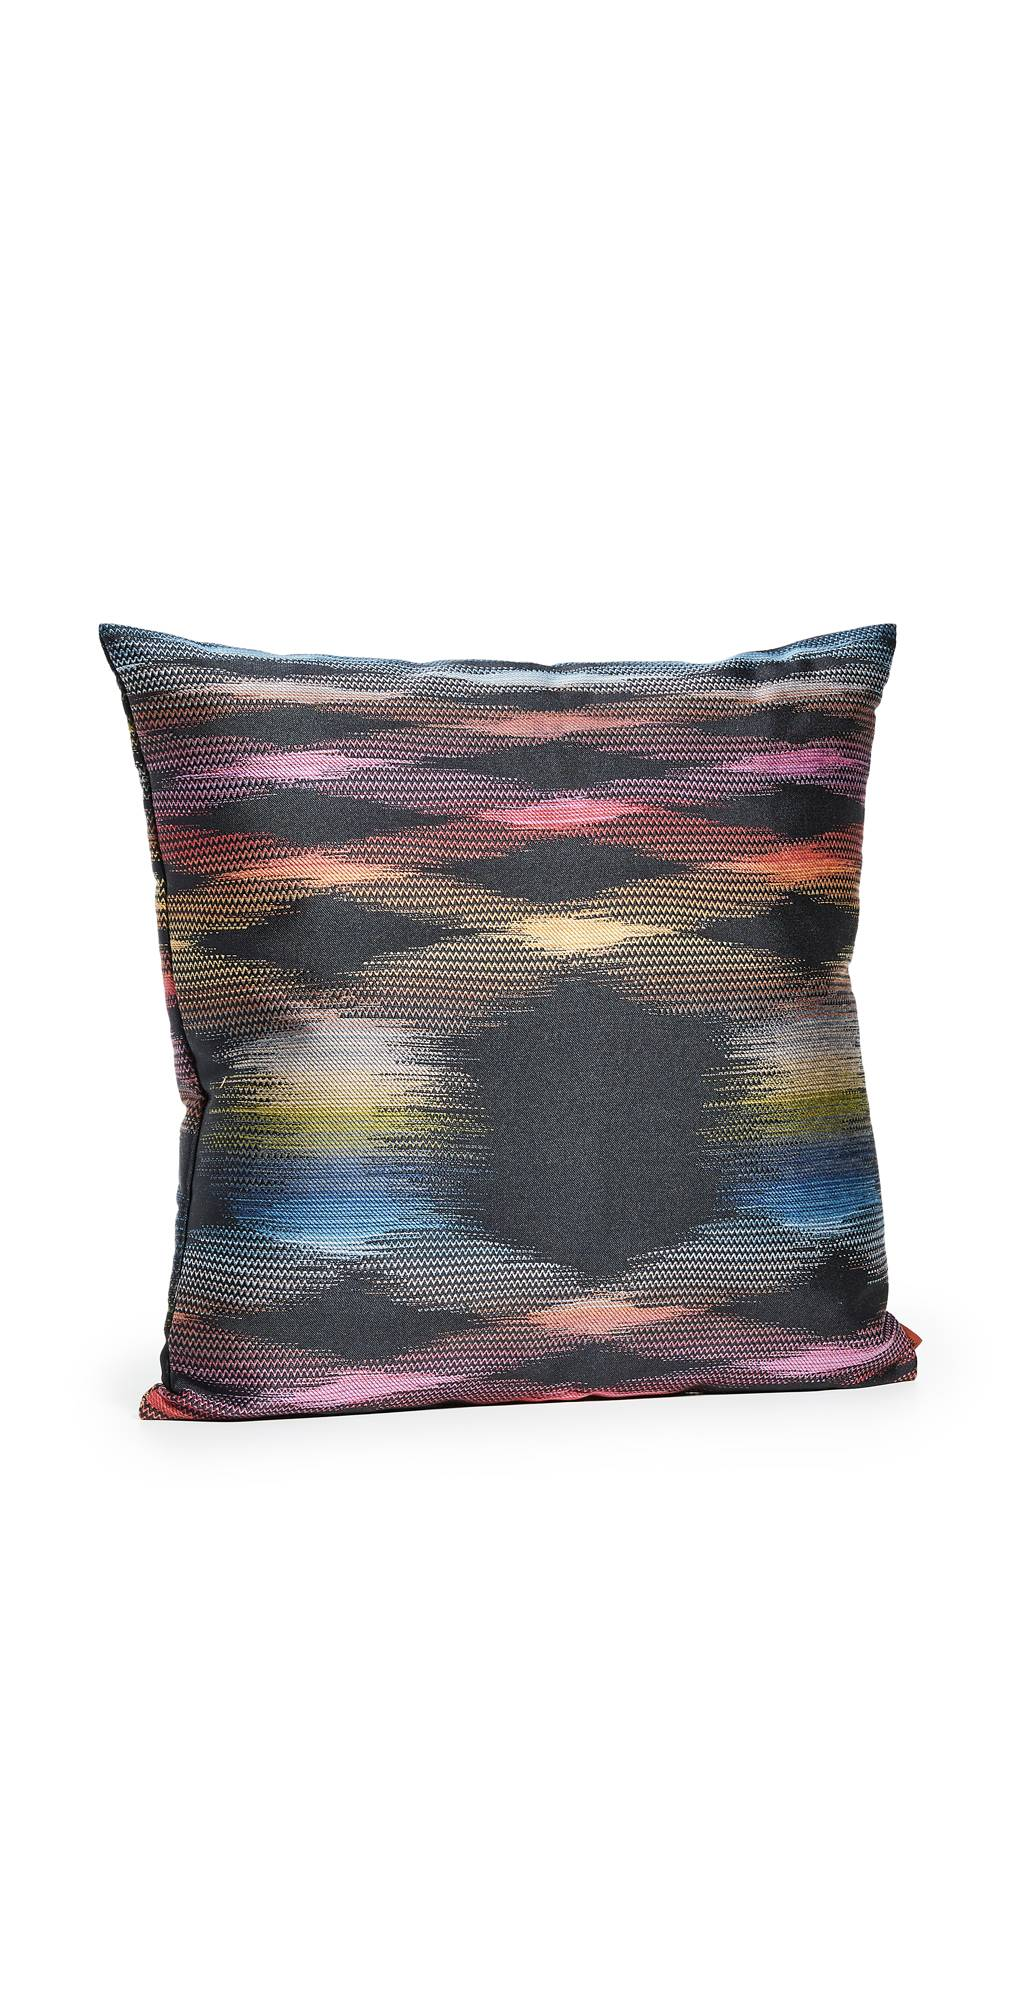 Missoni Home Stoccarda Cushion  - Multicolor - Size: One Size